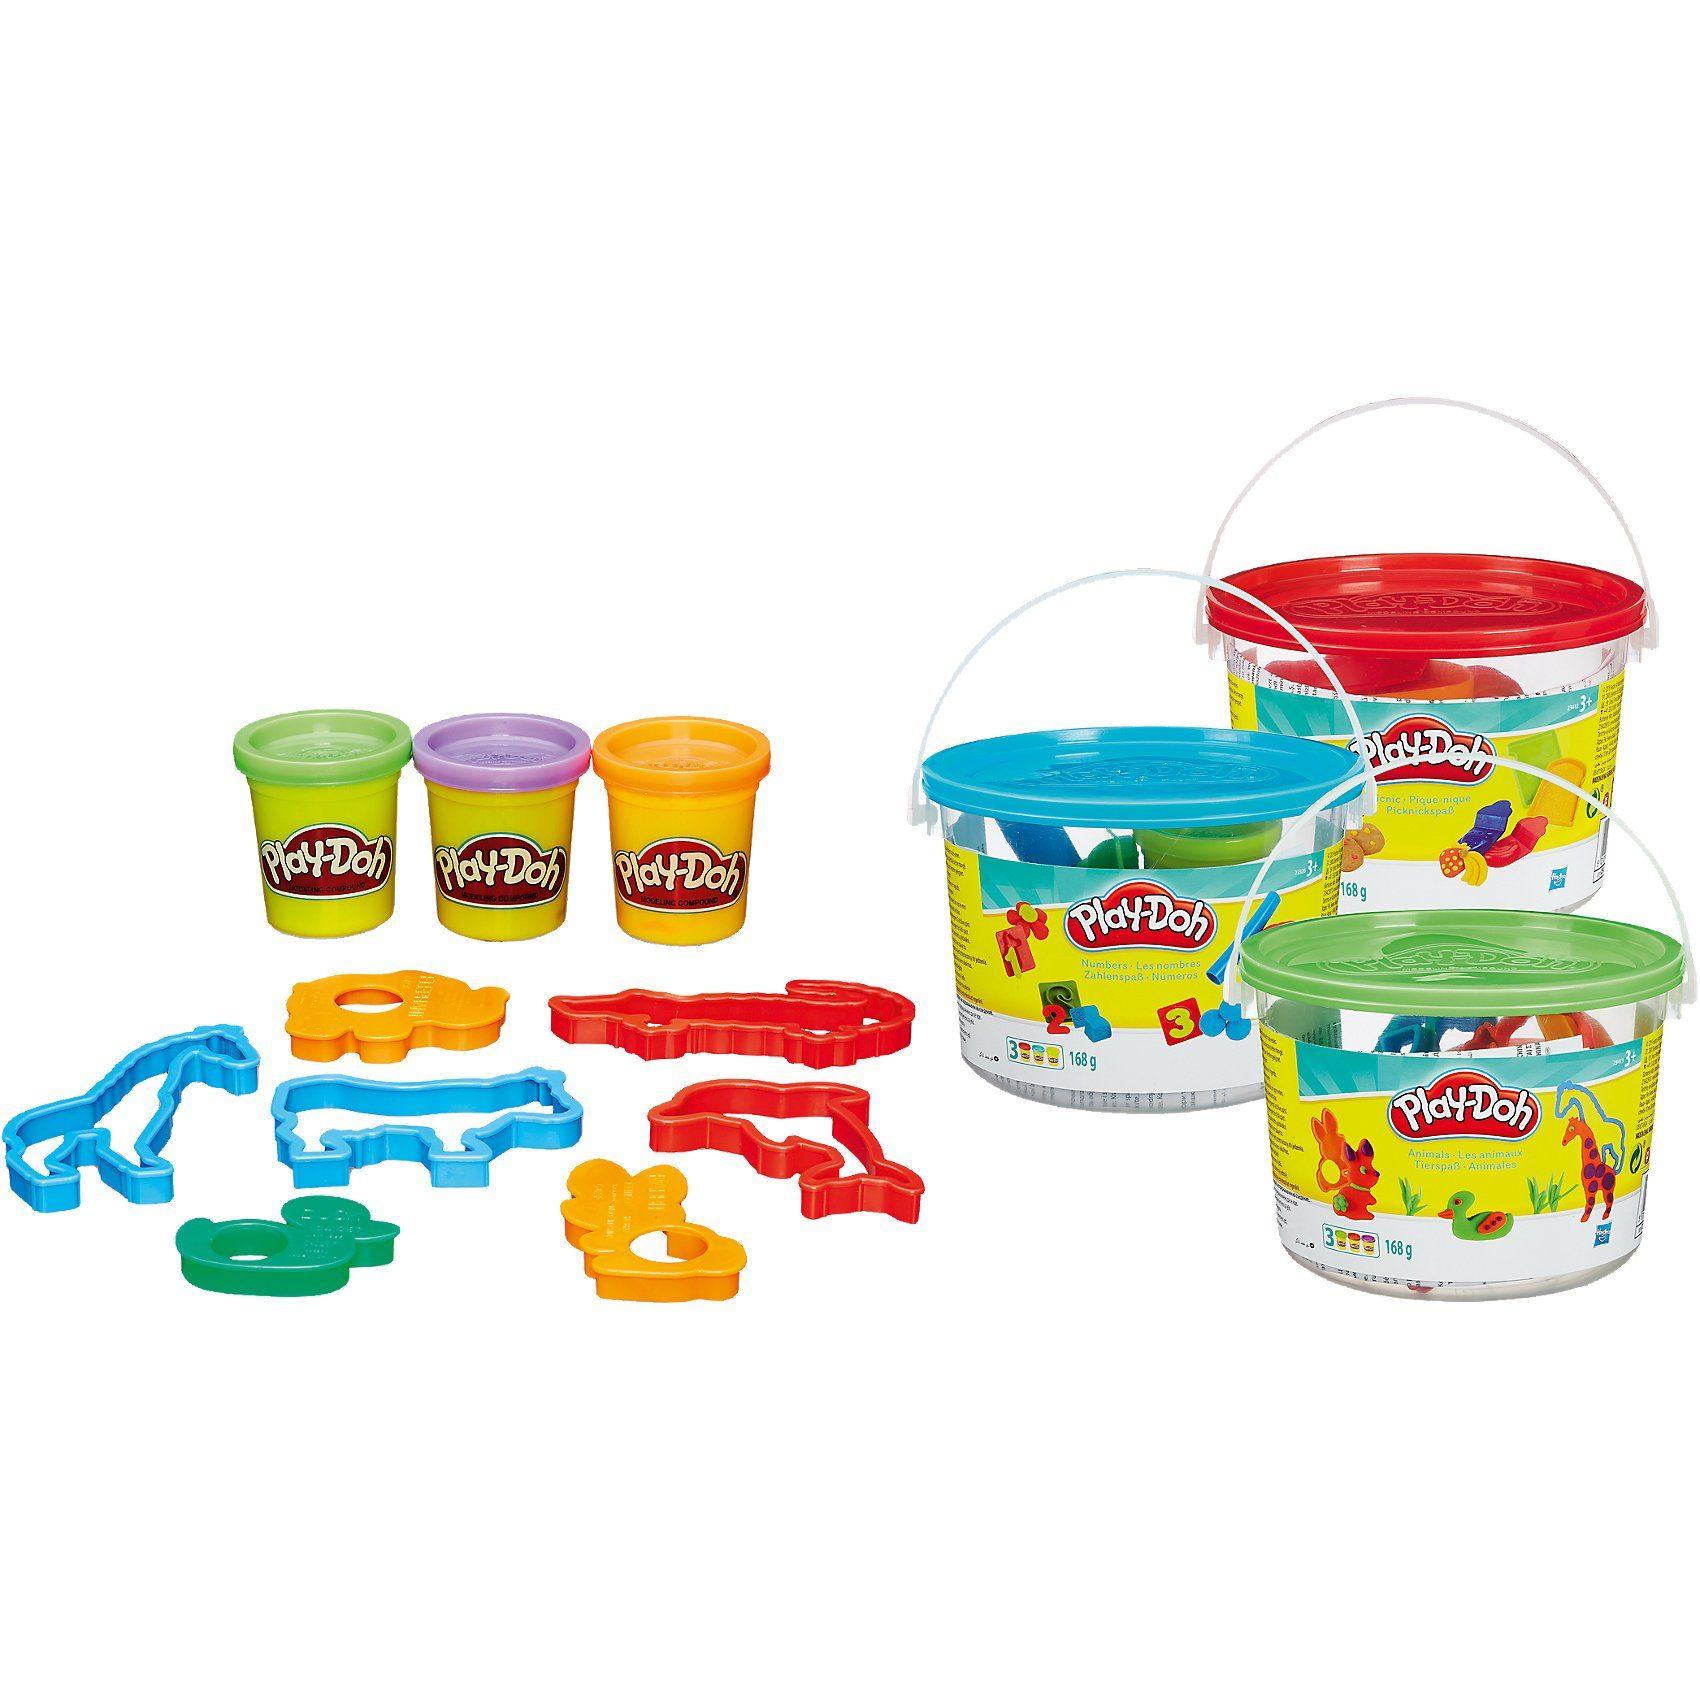 Hasbro Play-Doh Spaßeimer, Sortiment